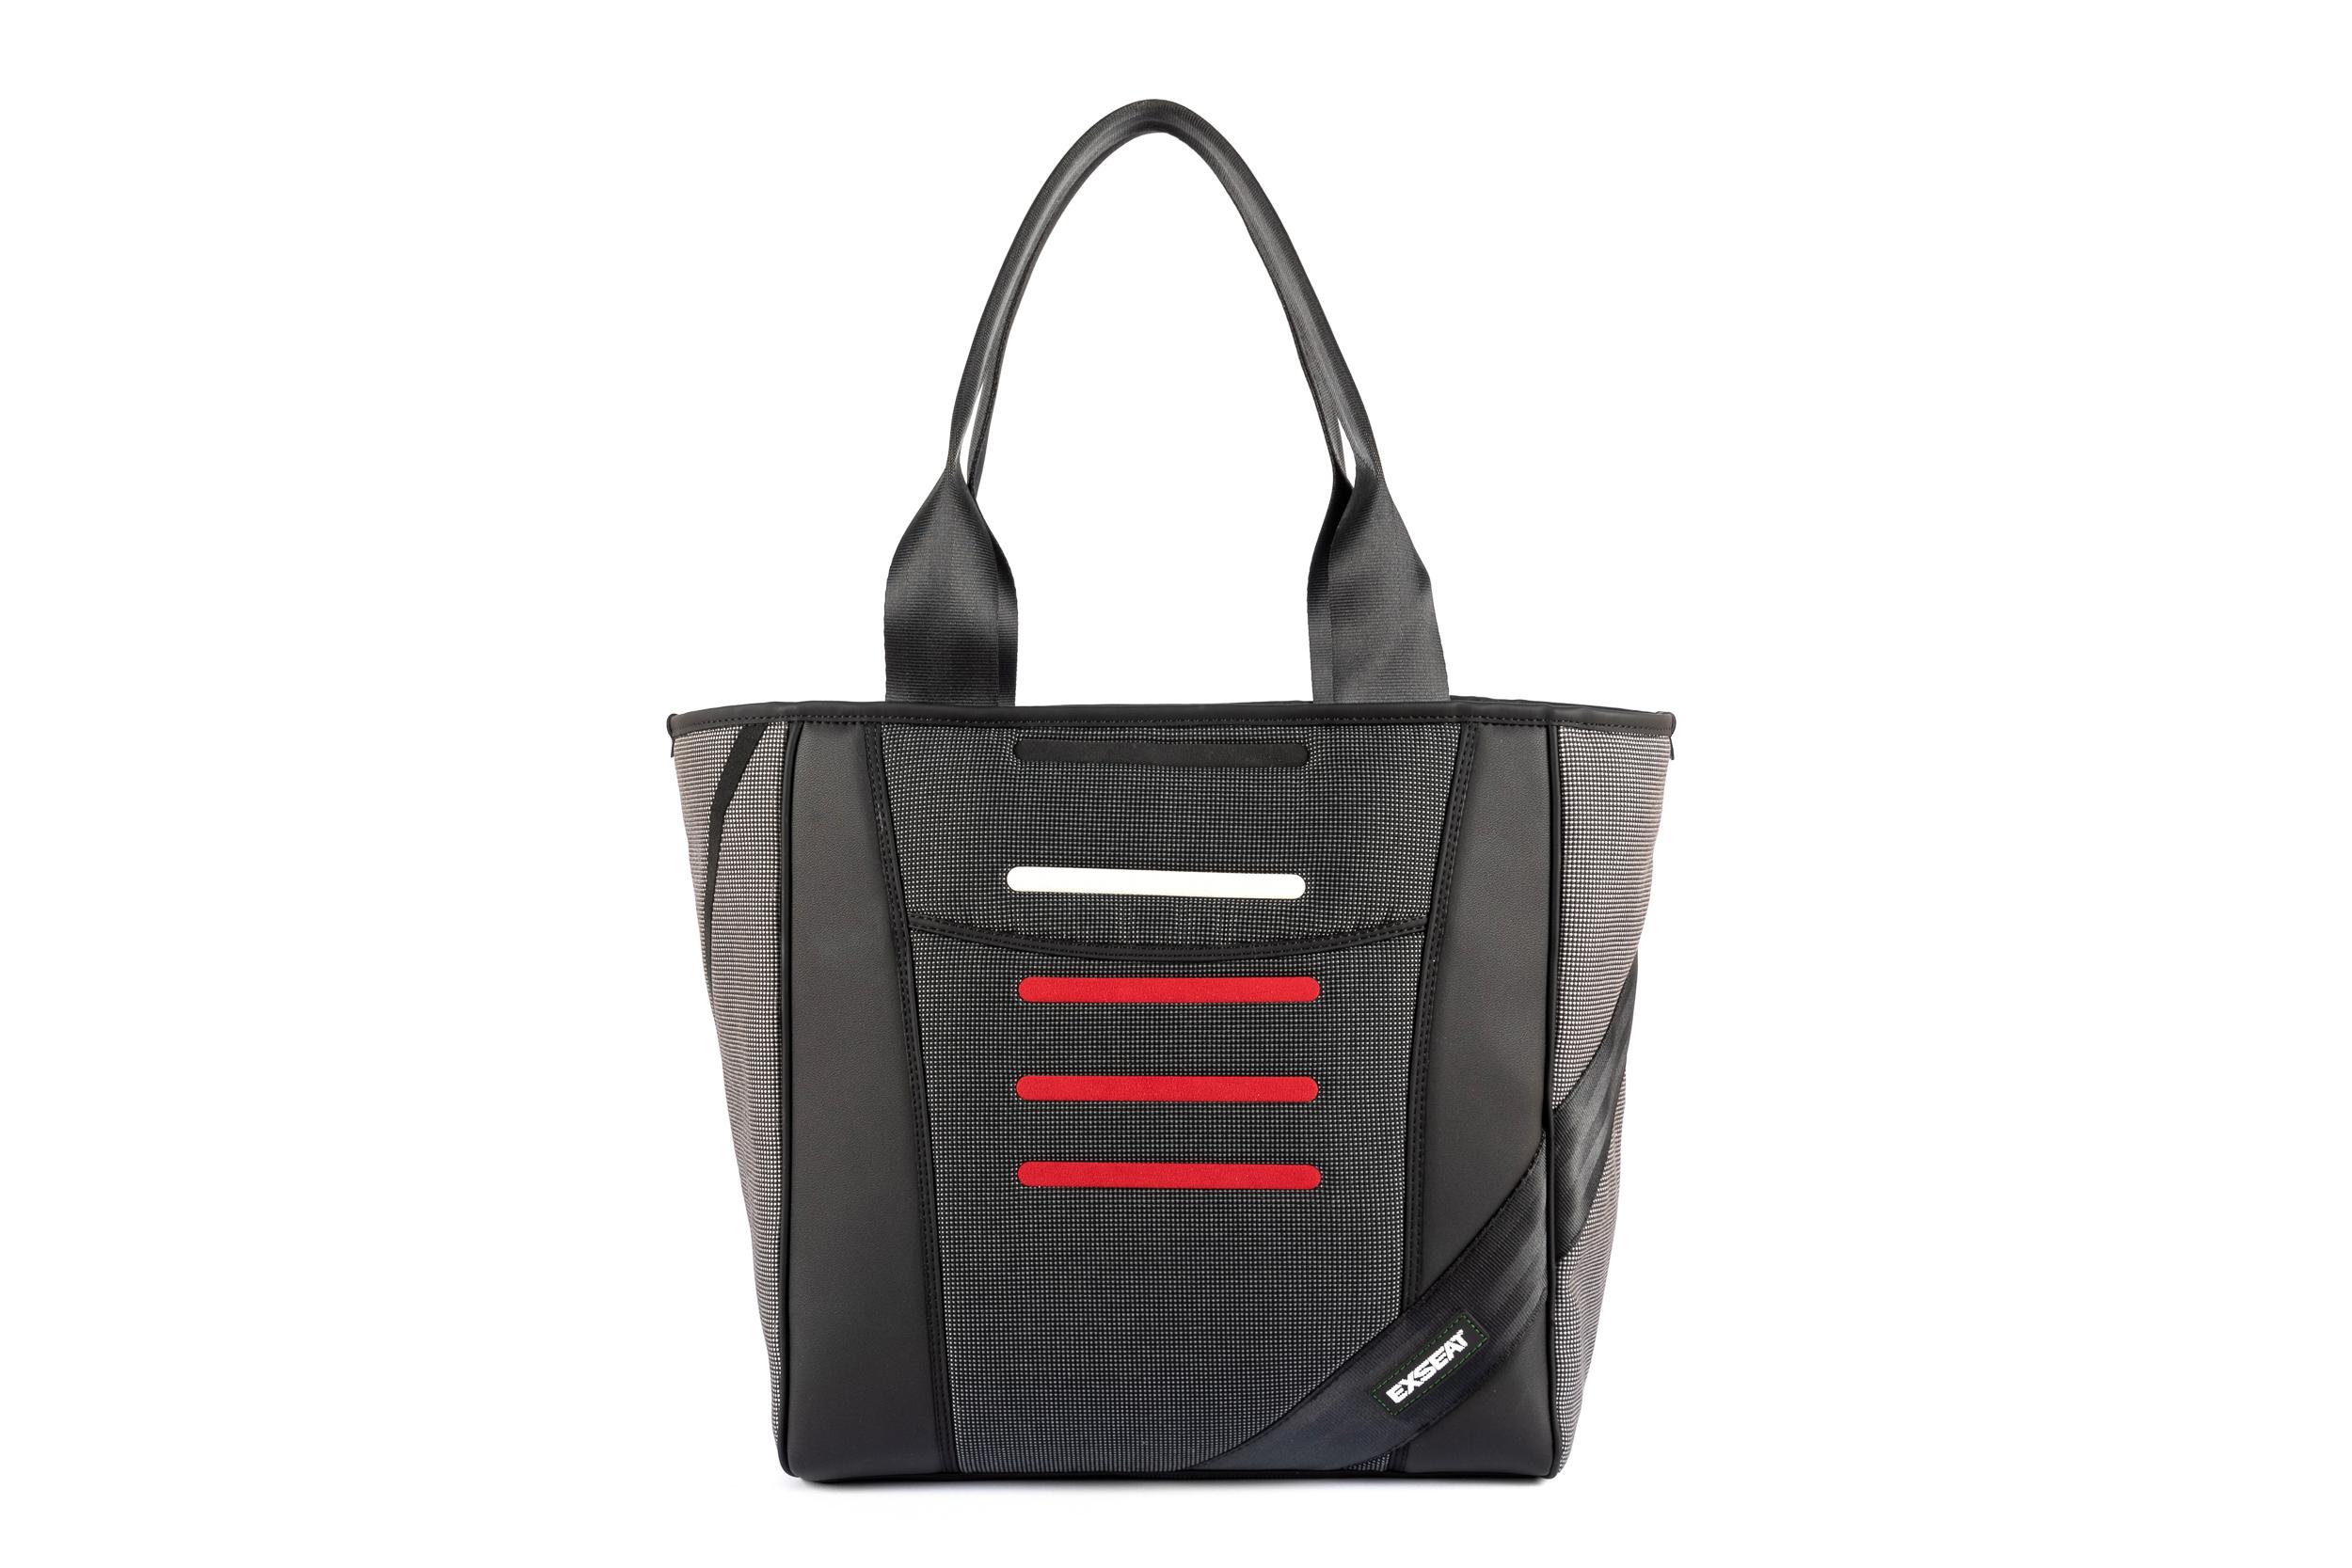 borsa eco-friendly shopper daytona